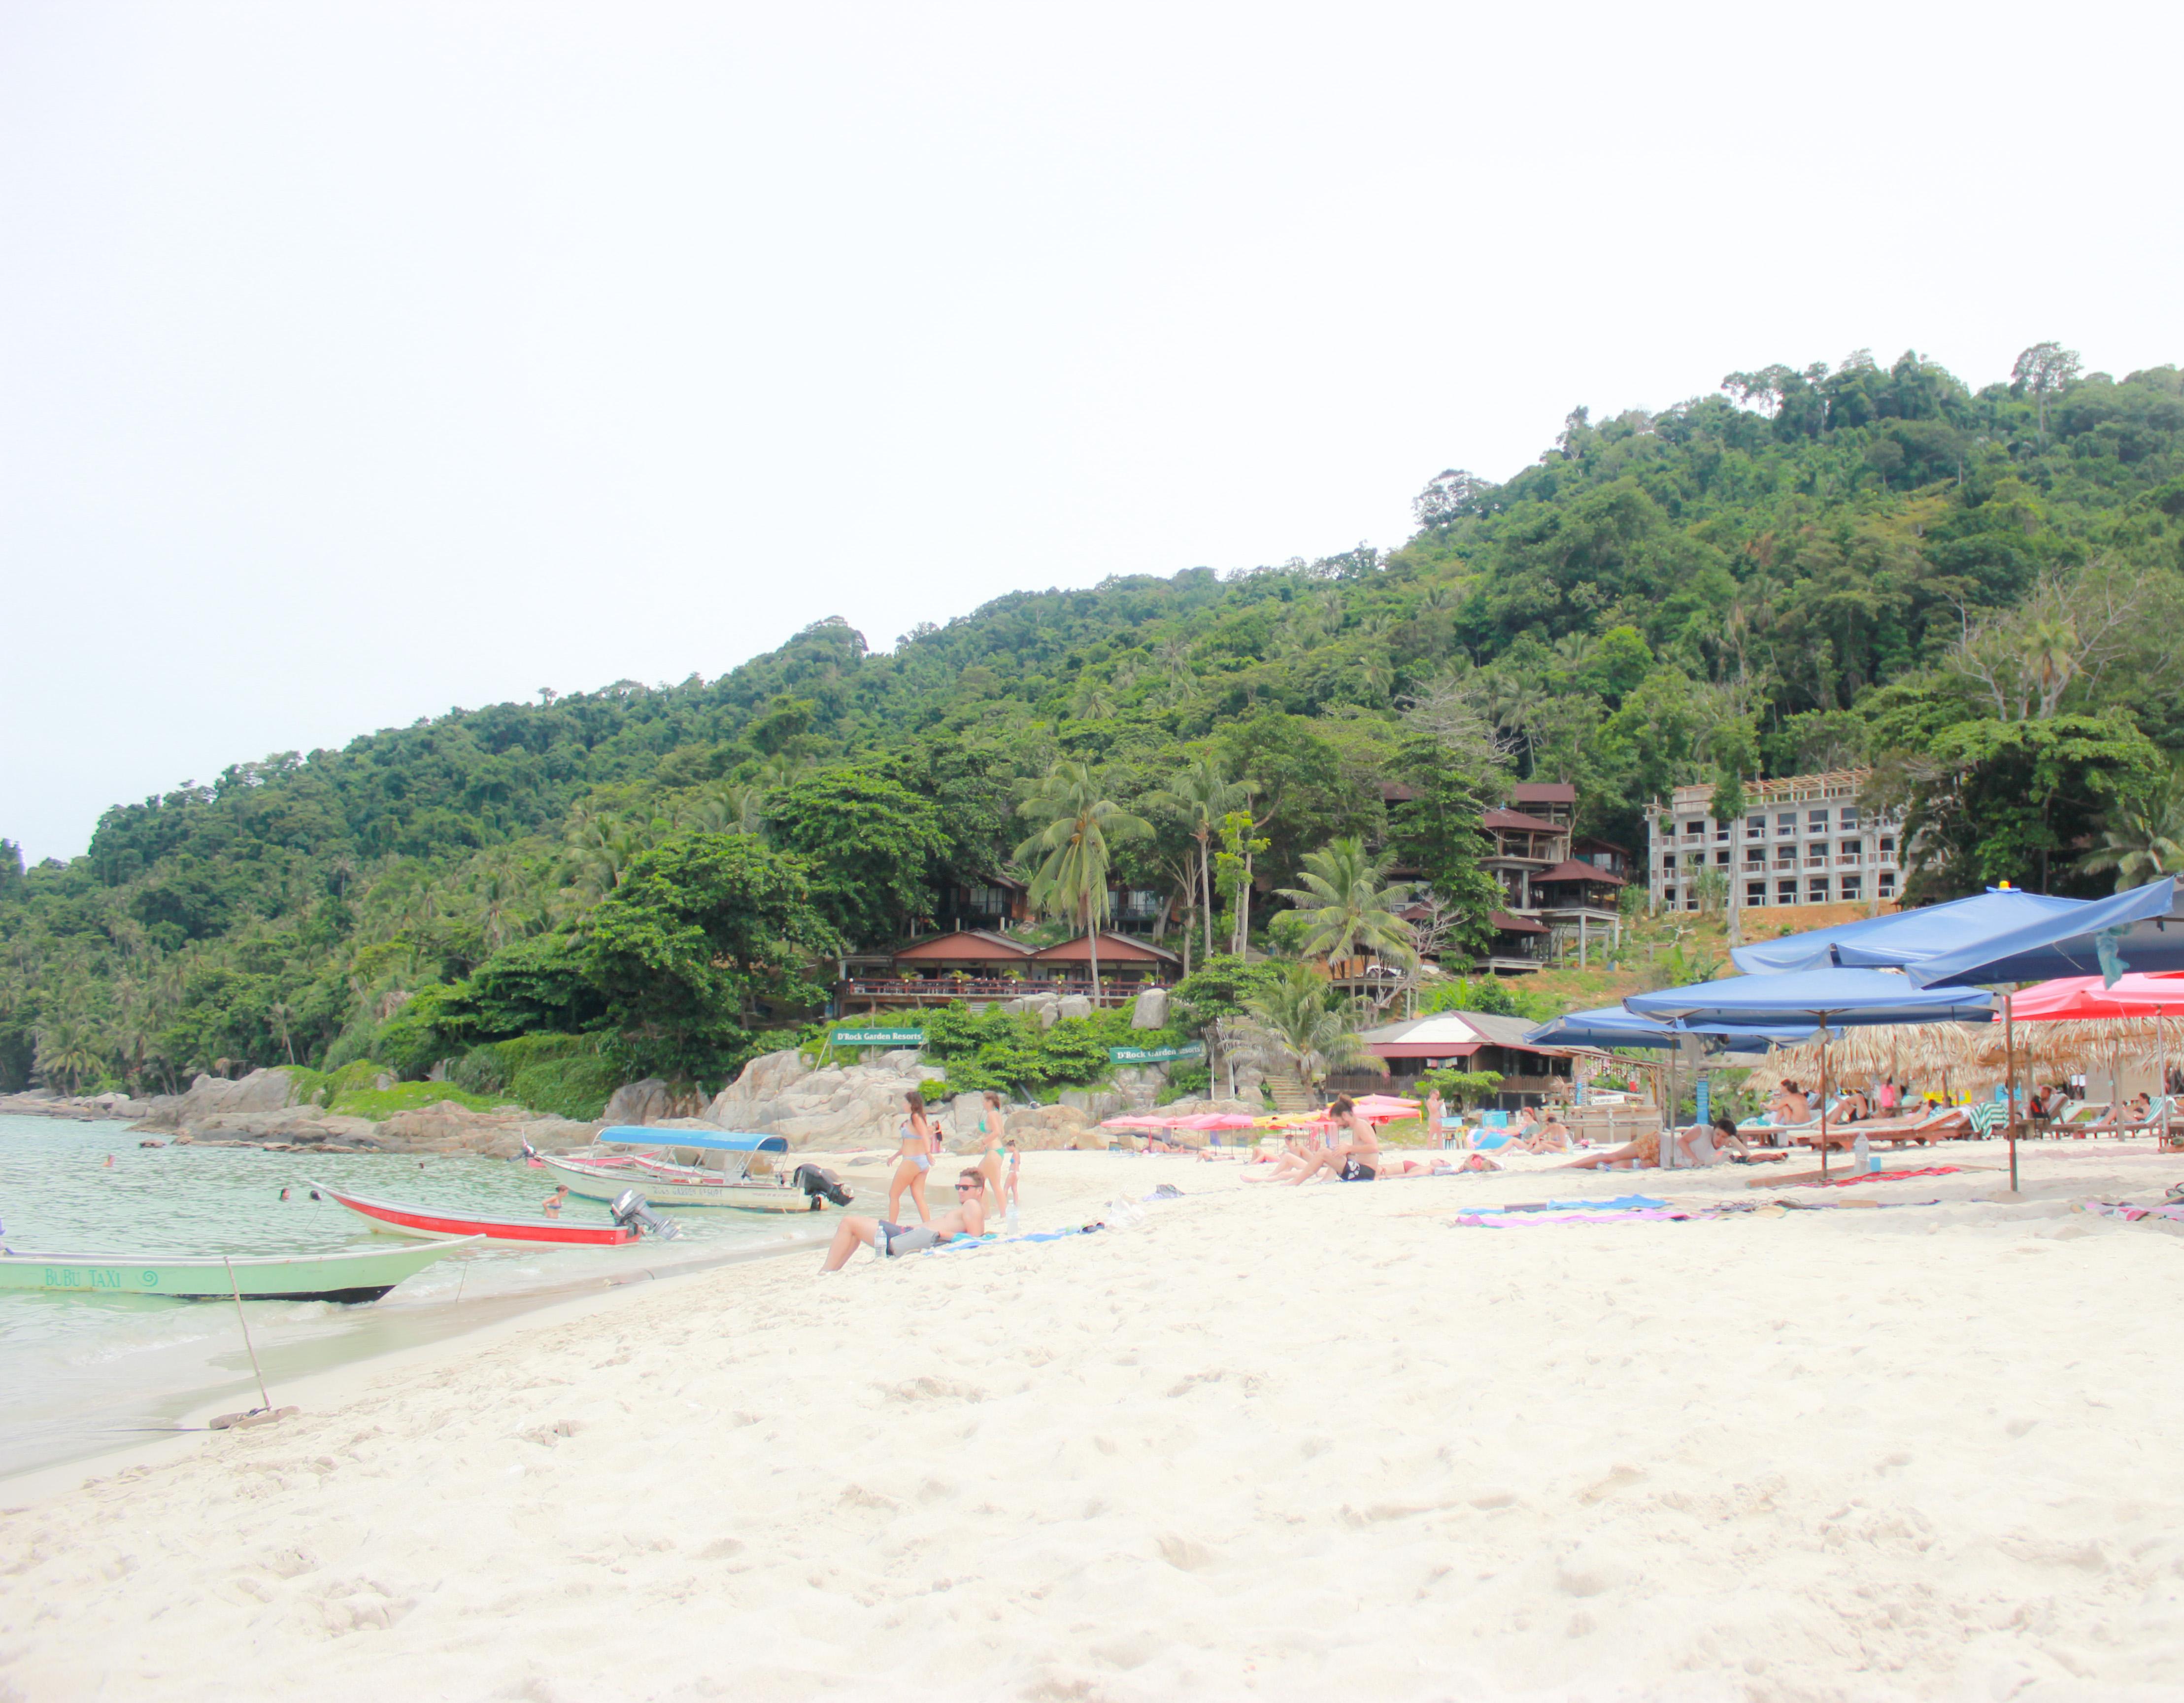 Image de la plage de Pulau kecil